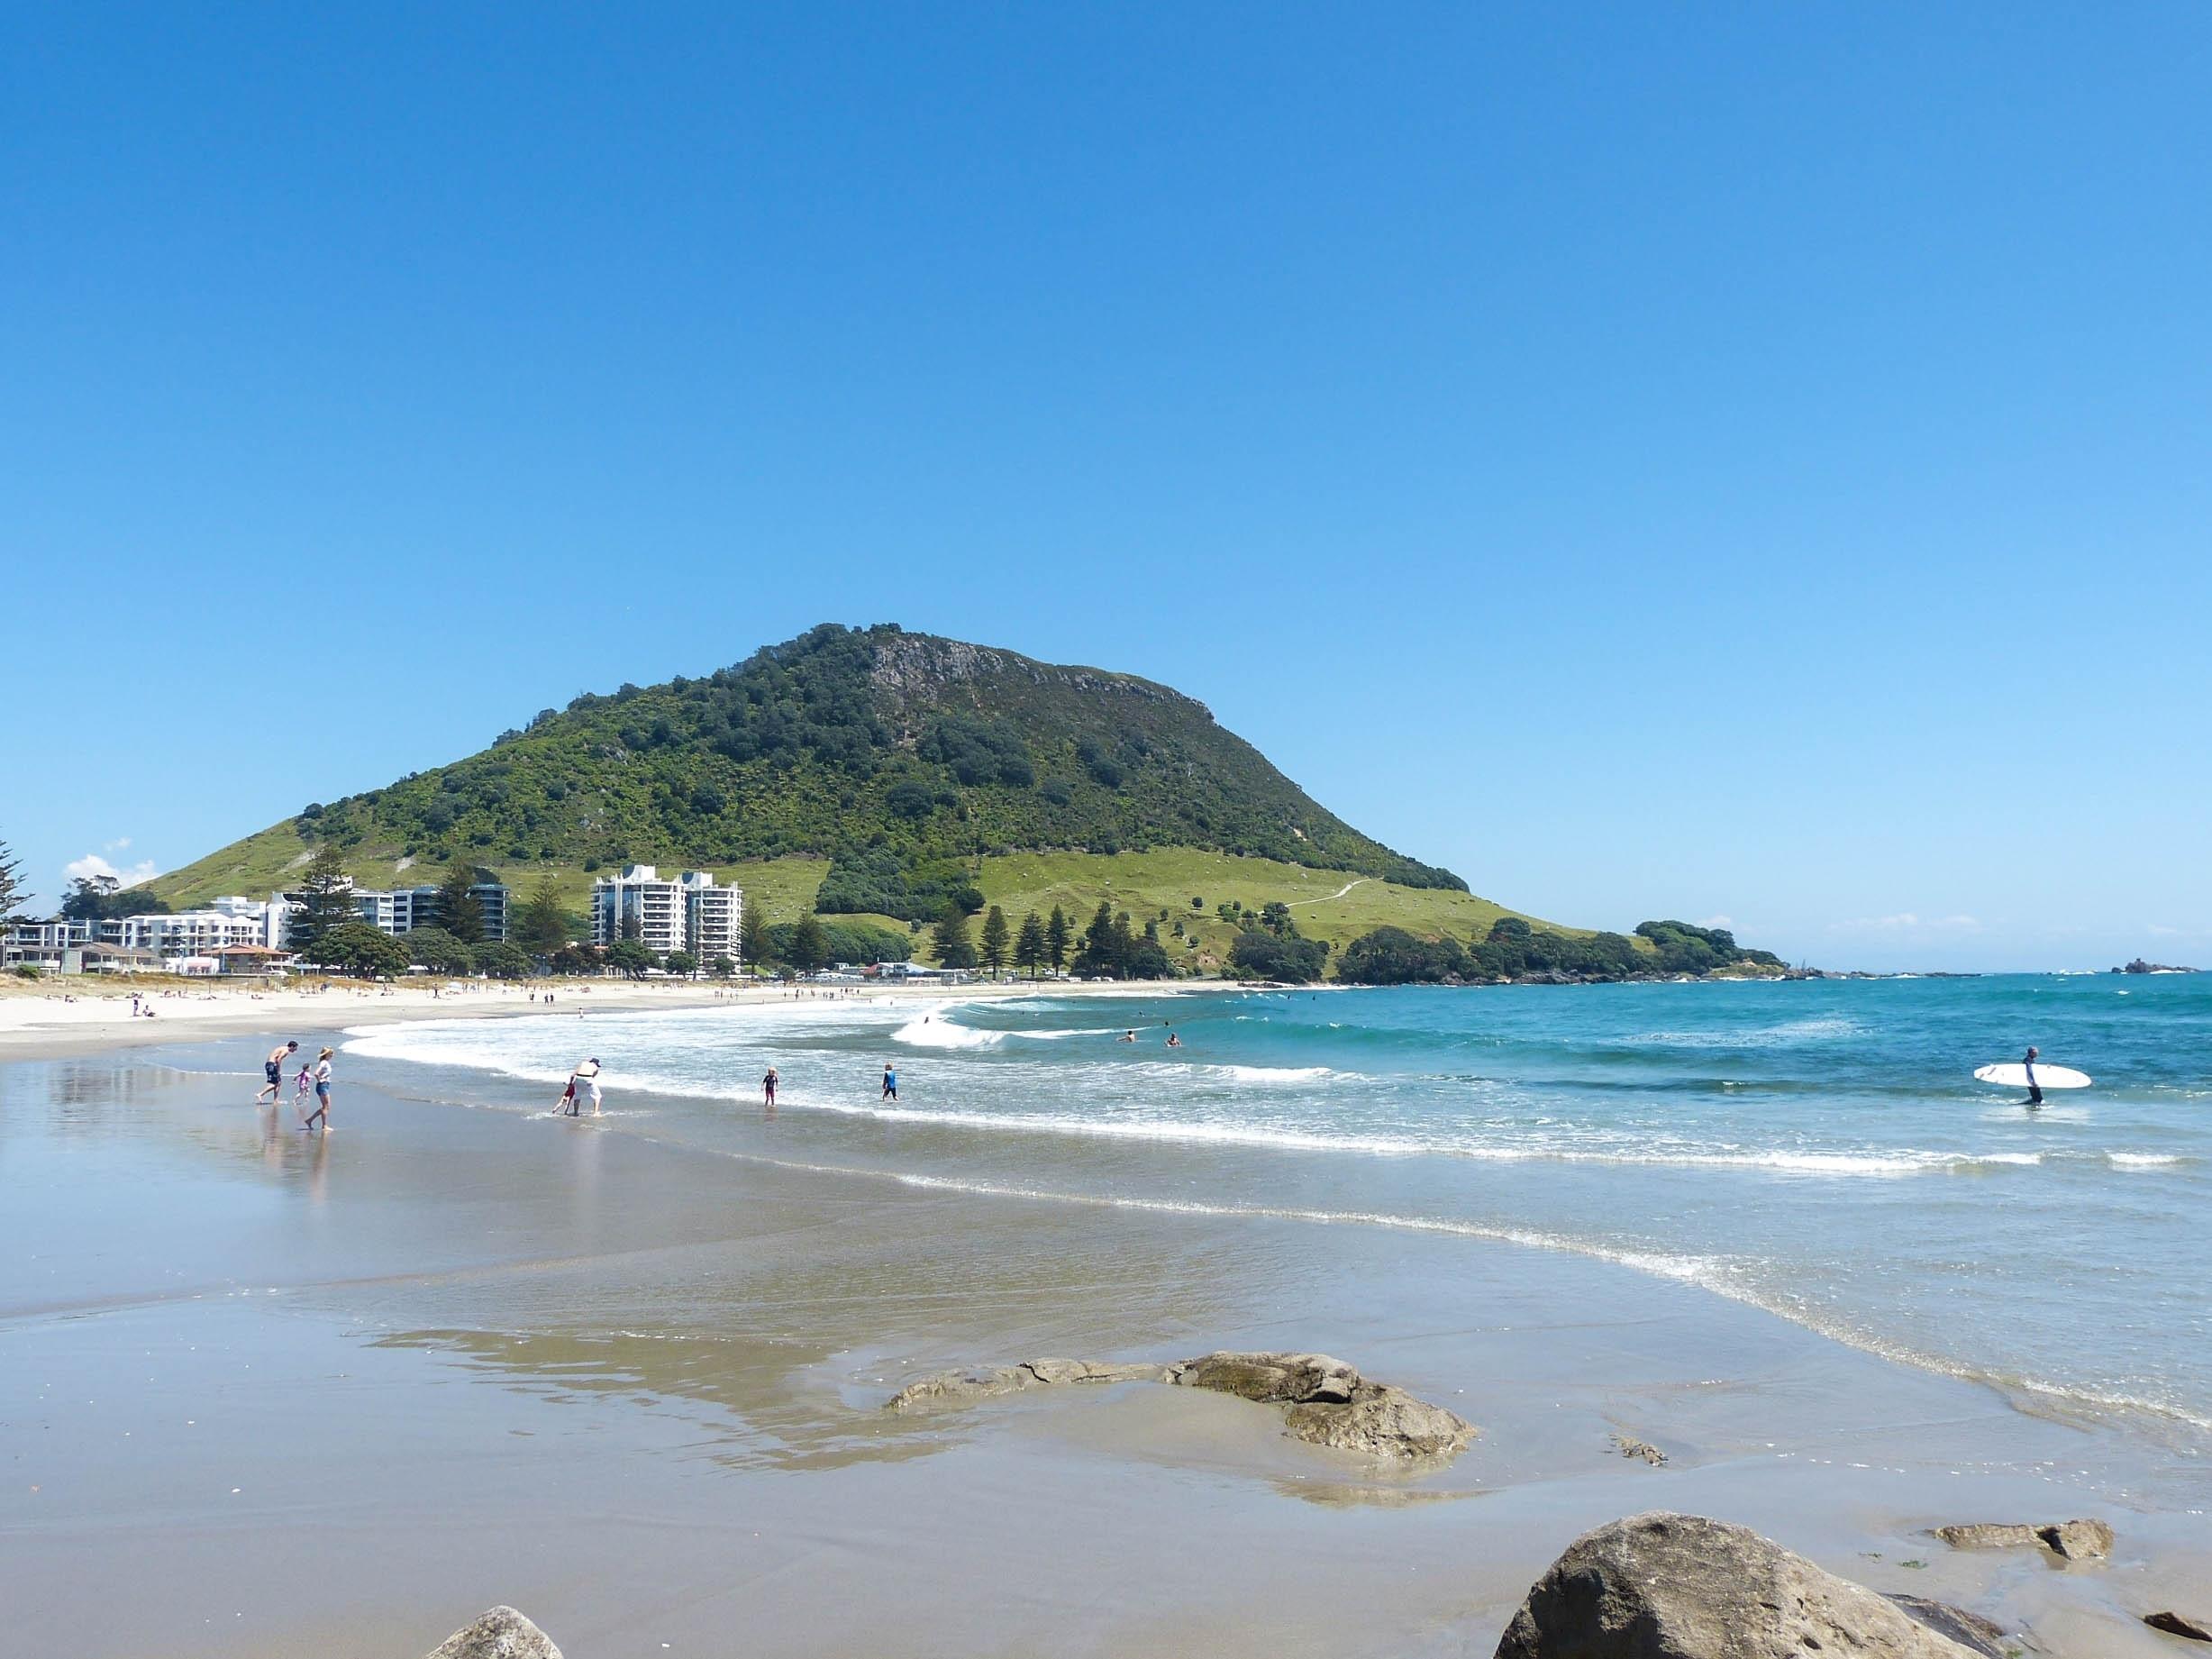 Papamoa Beach, Tauranga, Bay of Plenty Region, New Zealand